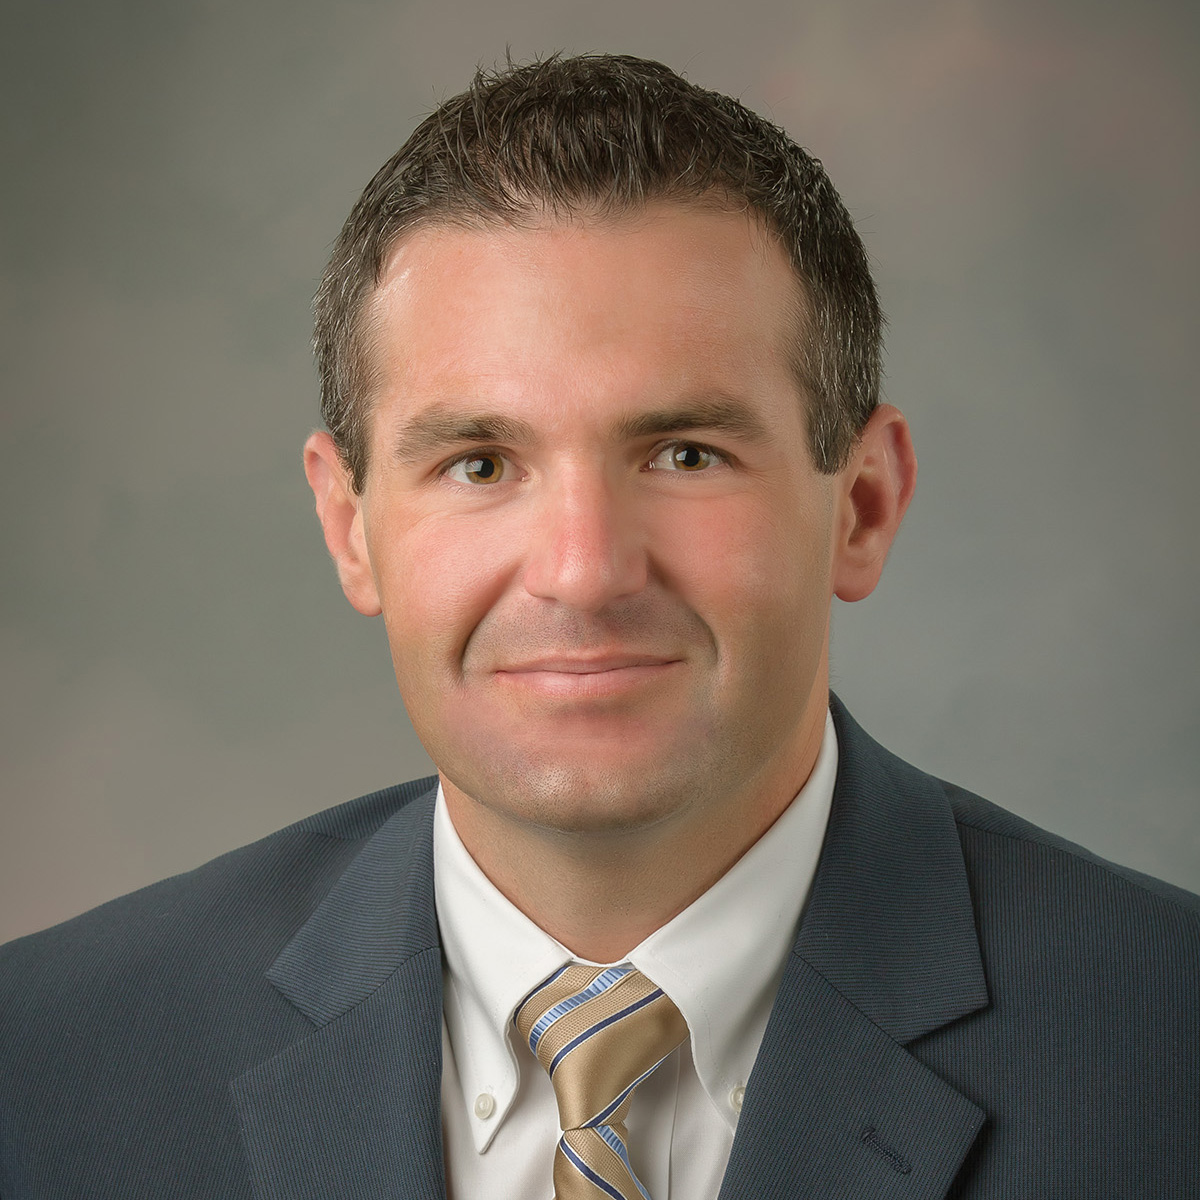 NICHOLAS J. HURSH - Practice AreasDomestic Relations, Business Organization, Employment, General Litigation, Personal Injury